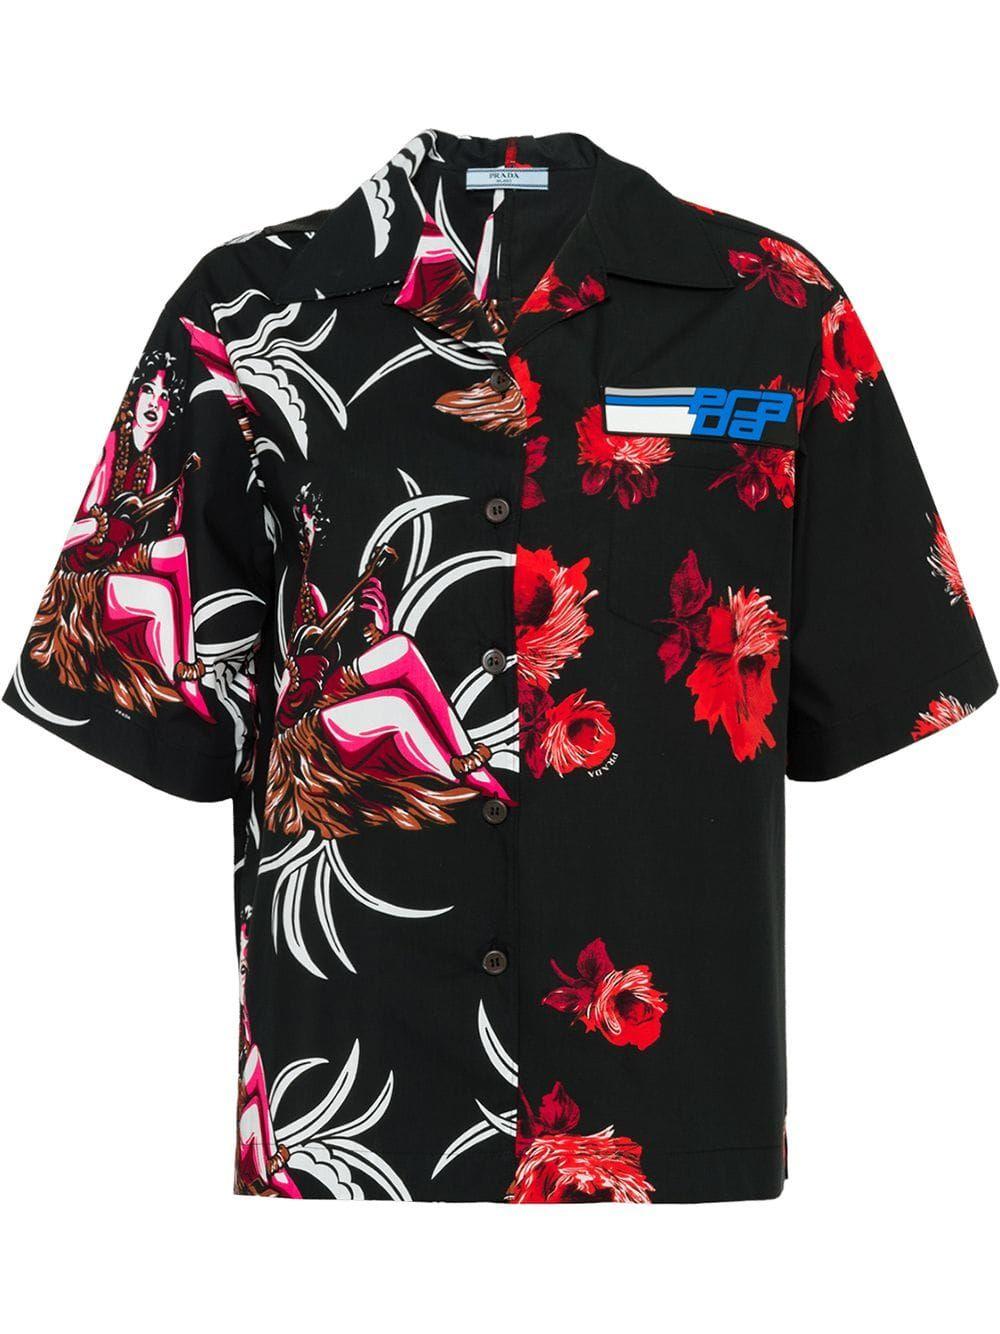 8e607c39 Prada floral short-sleeve shirt - Black | Products in 2019 | Shirts ...